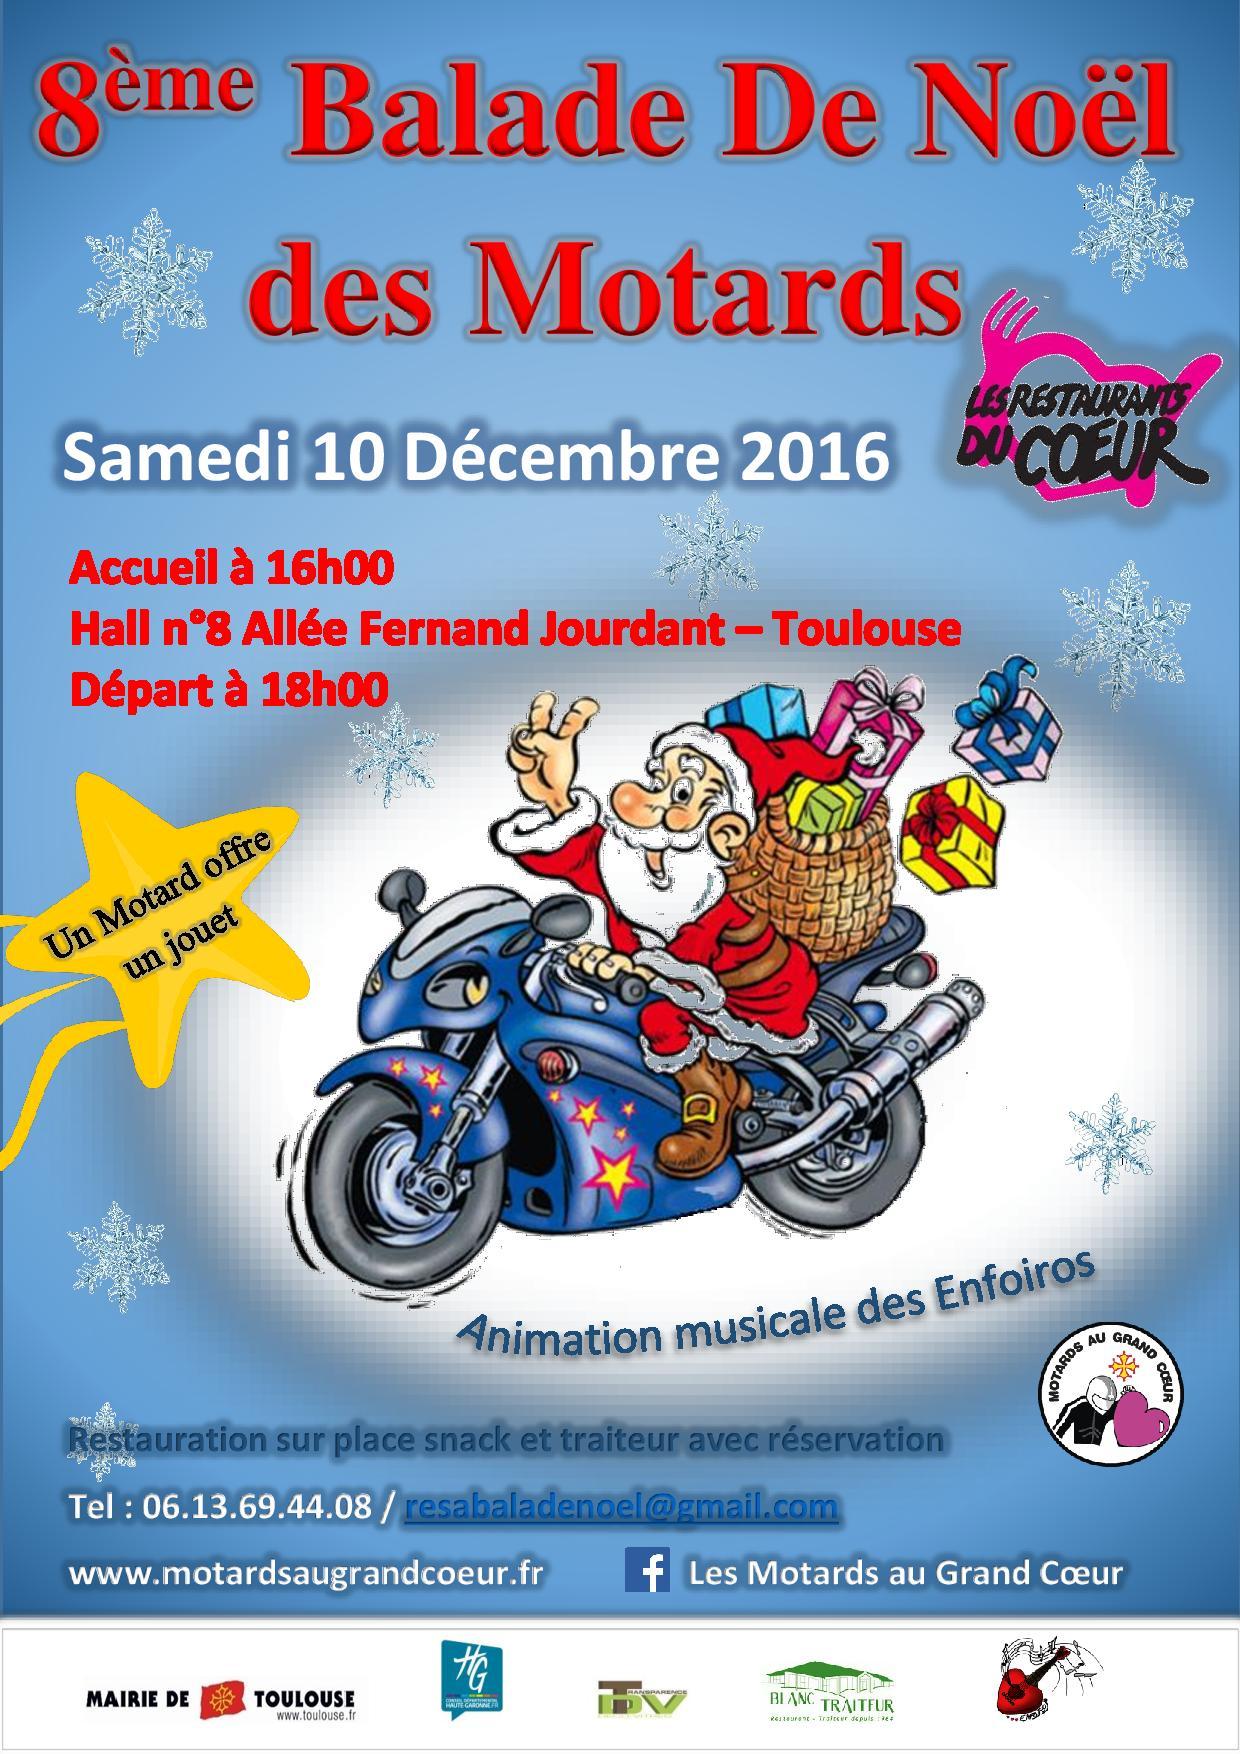 balade moto noel paris 2018 Balade de Noël des Motards au grand coeur à Toulouse ()   Moto  balade moto noel paris 2018